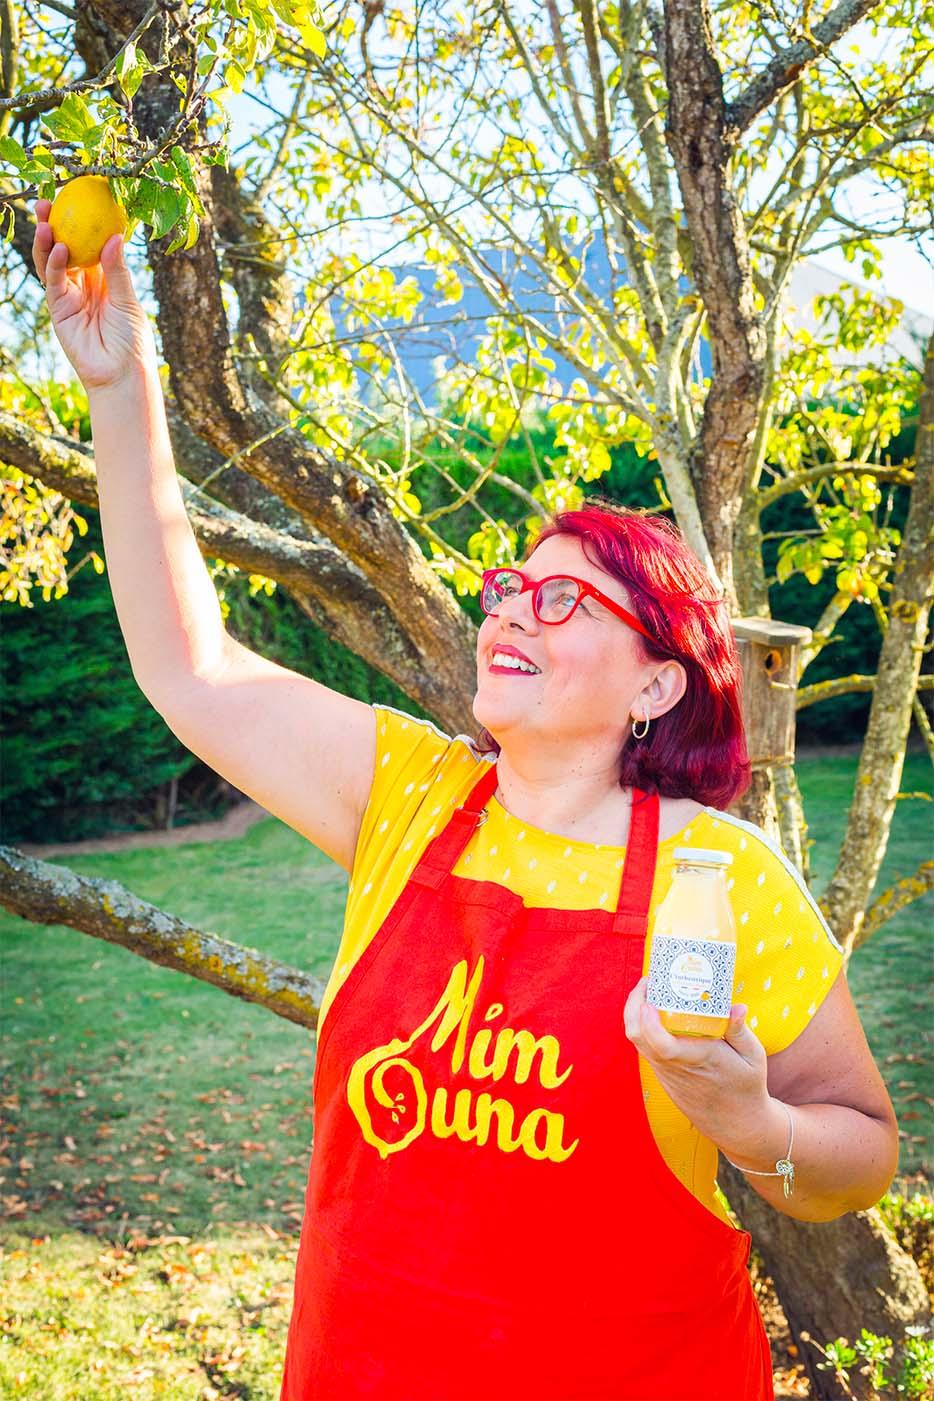 Nabila Namoune, fondatrice des citronnades bio et artisanales mimouna